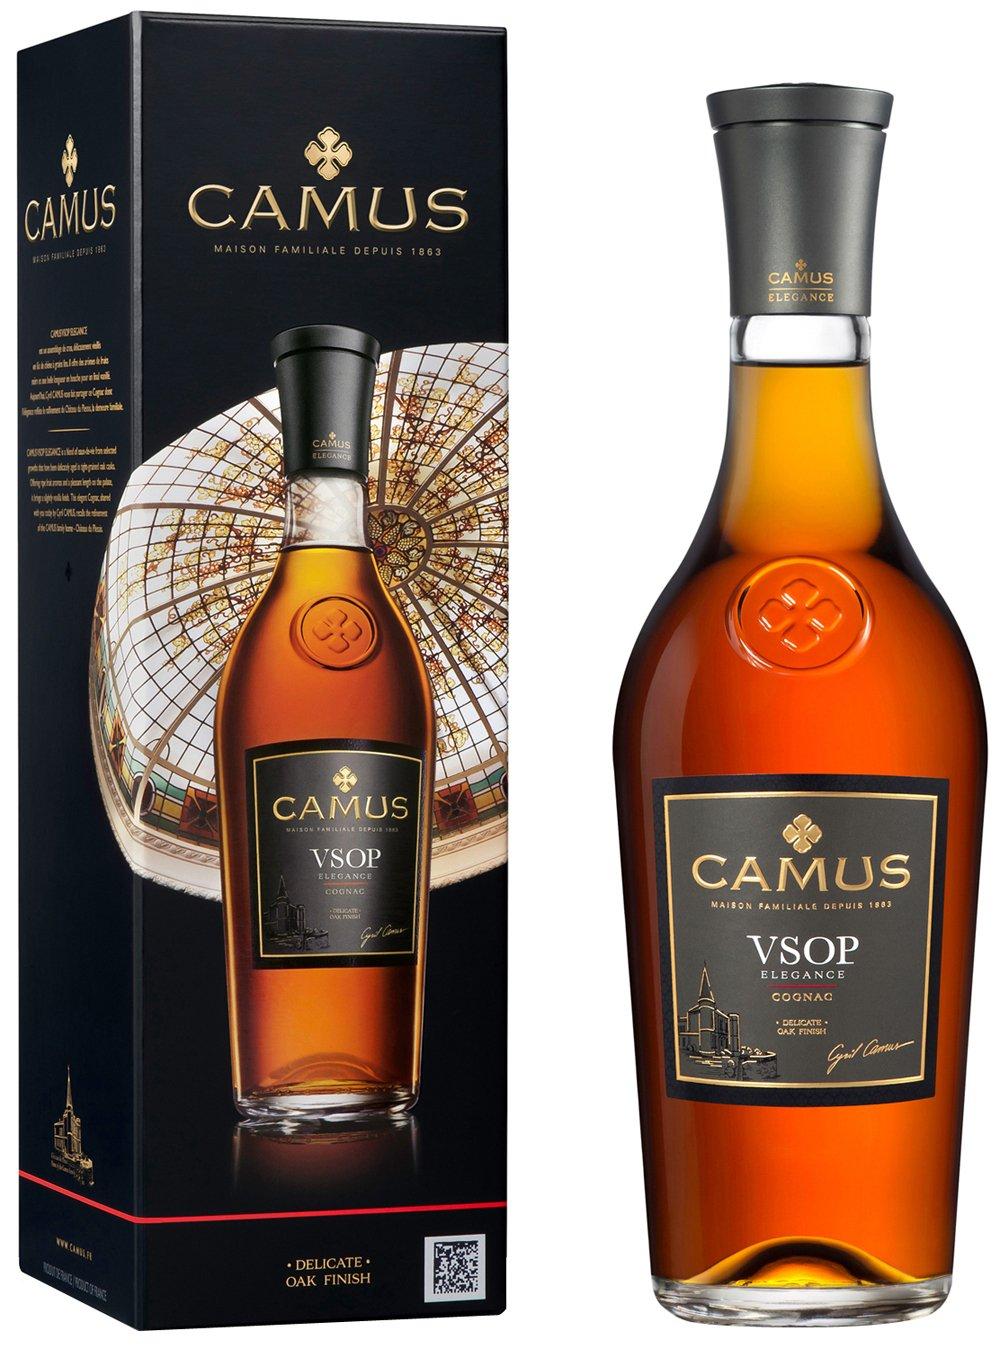 Camus-VSOP-Cognac